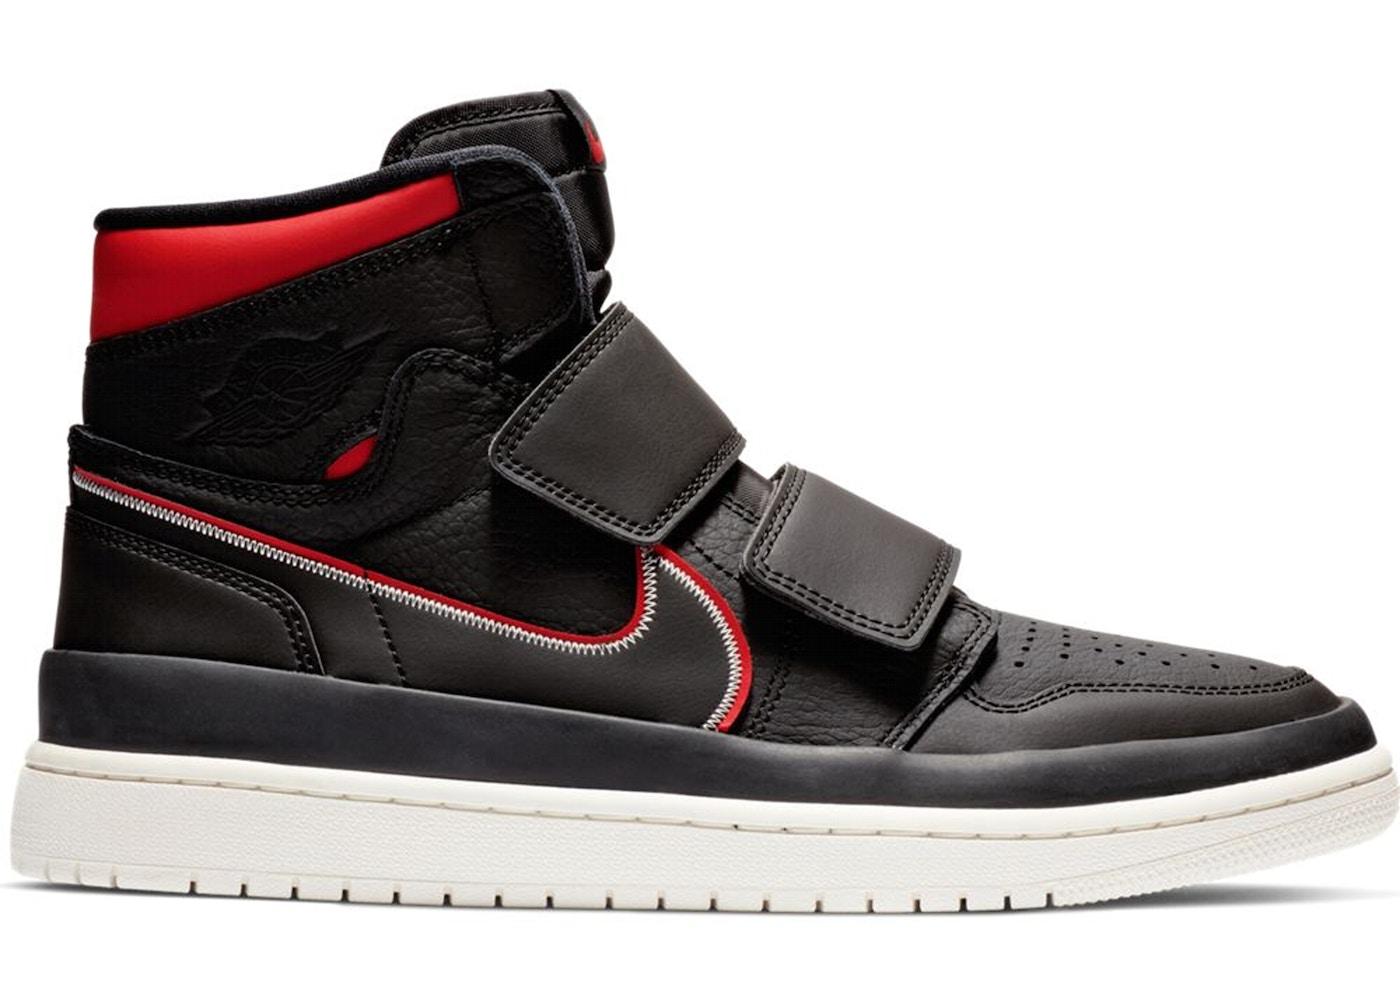 best service eba8c 205f9 Air Jordan 1 Size 17 Shoes - Release Date